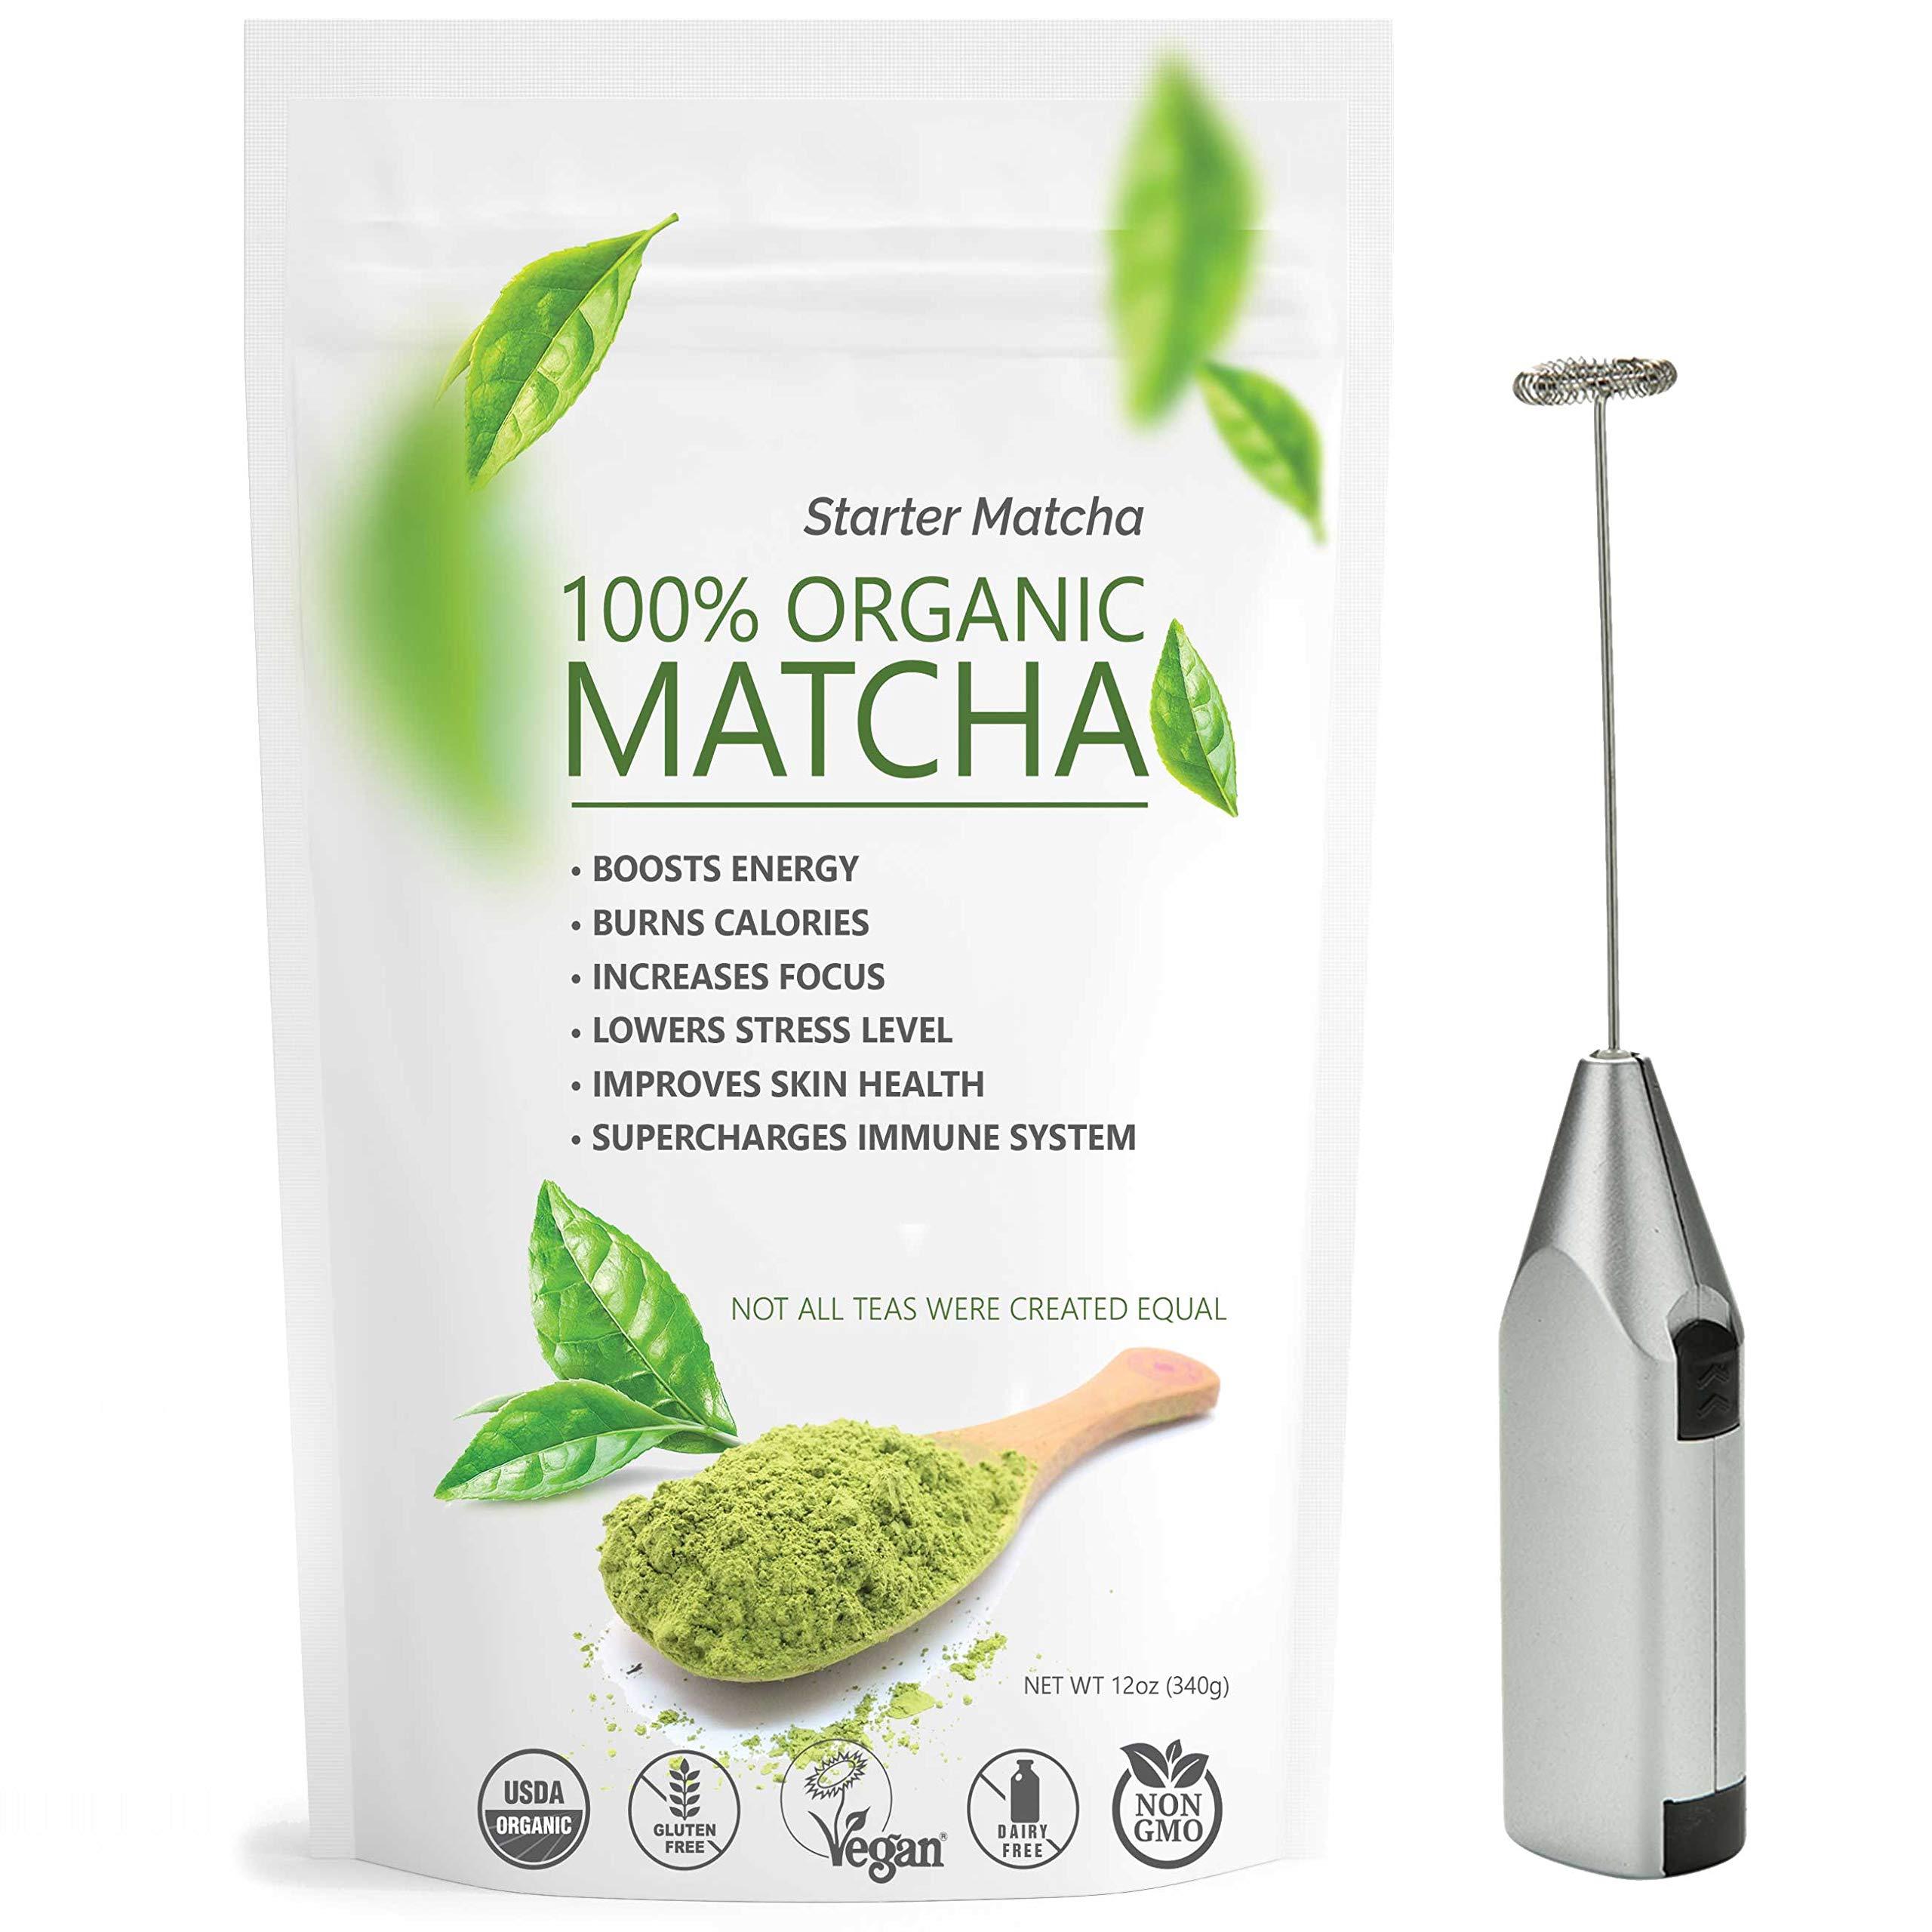 Starter Matcha Green Tea Powder 12oz + Electric Frother Bundle | USDA Organic | Vegan | GMO-Free | Matcha for Baking | Latte | Smoothie | Cookies | Ice Cream by Matchaccino